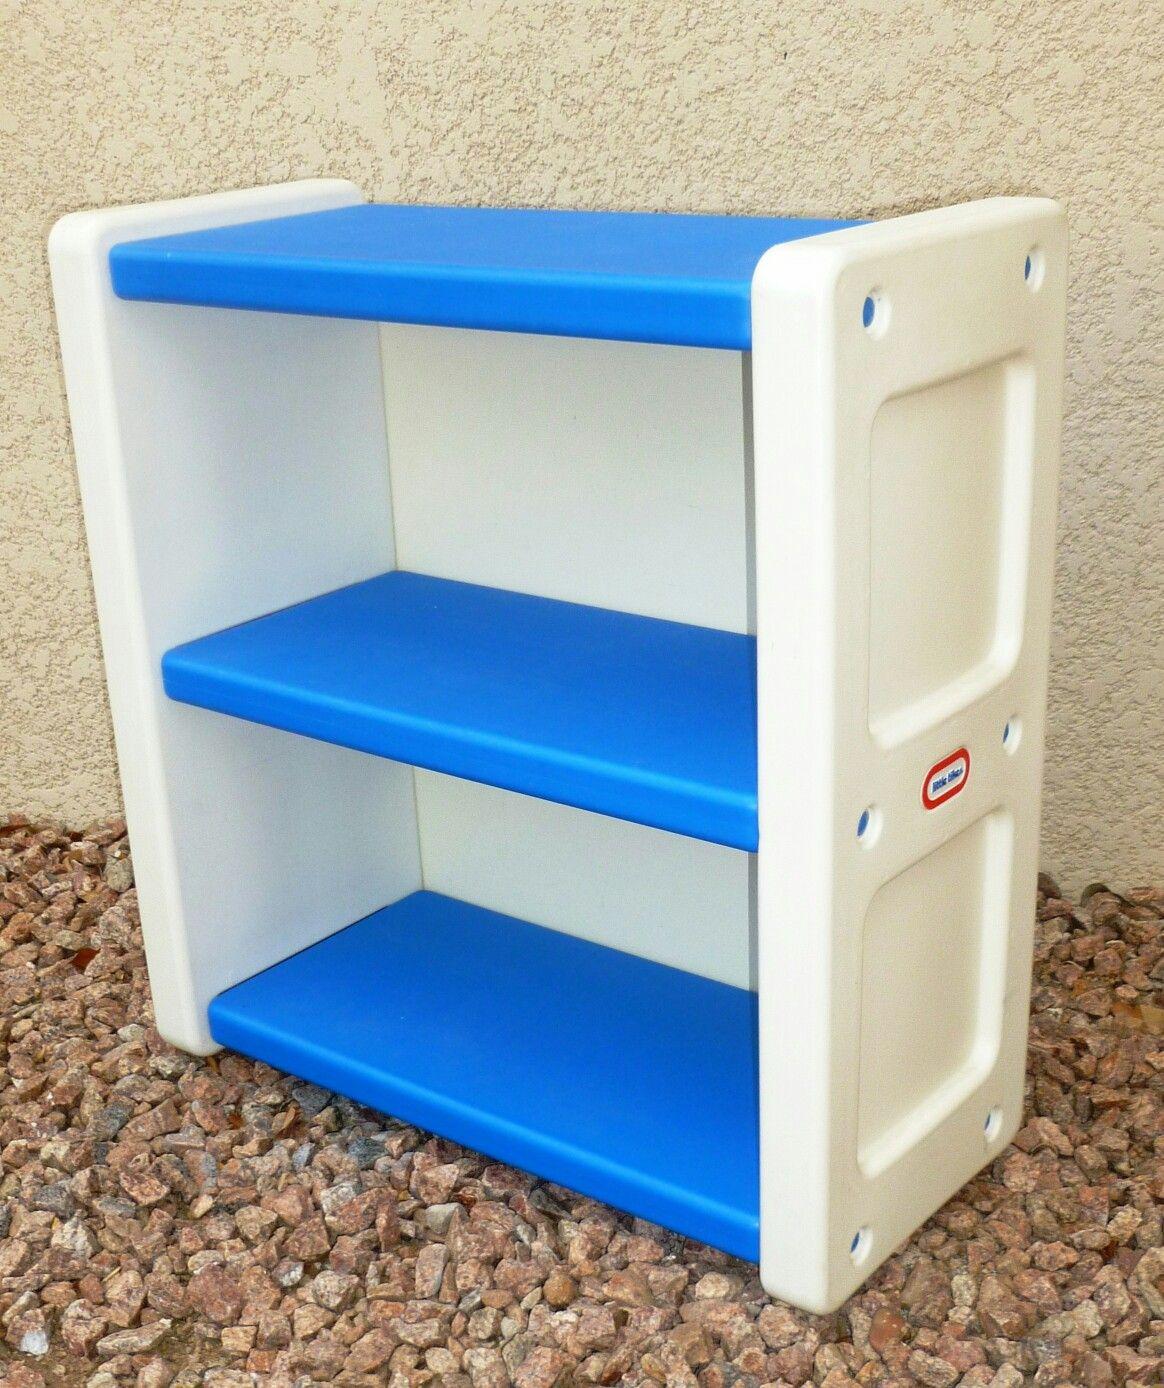 Little Tikes Bookcase Outdoor Toys For Kids Tikes Toys Childhood Toys